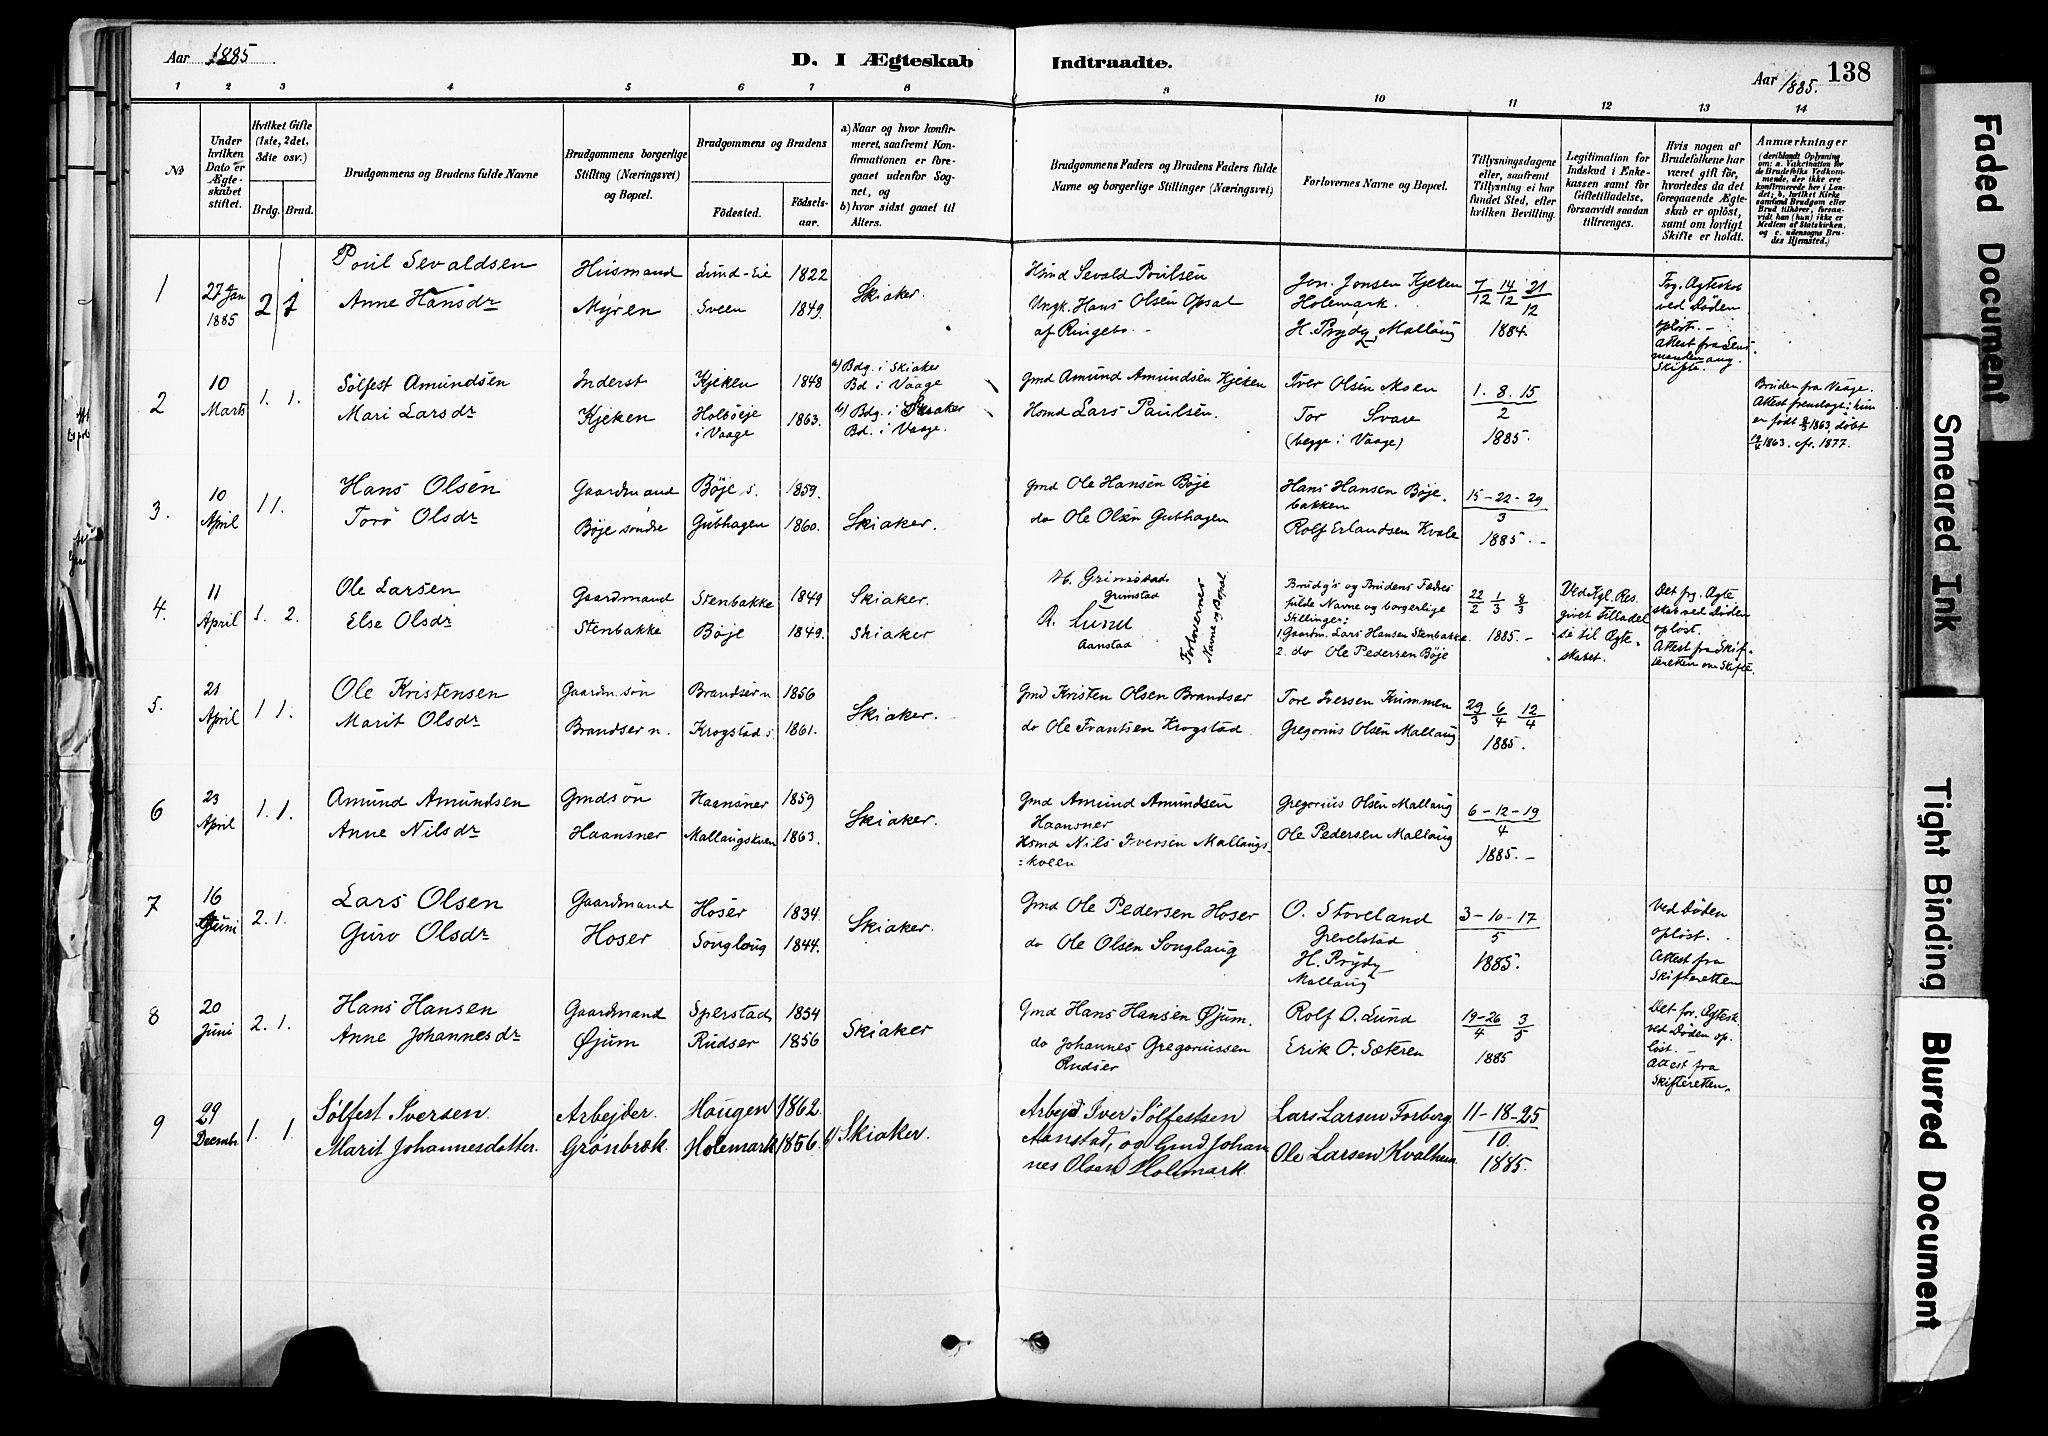 SAH, Skjåk prestekontor, Ministerialbok nr. 3, 1880-1907, s. 138